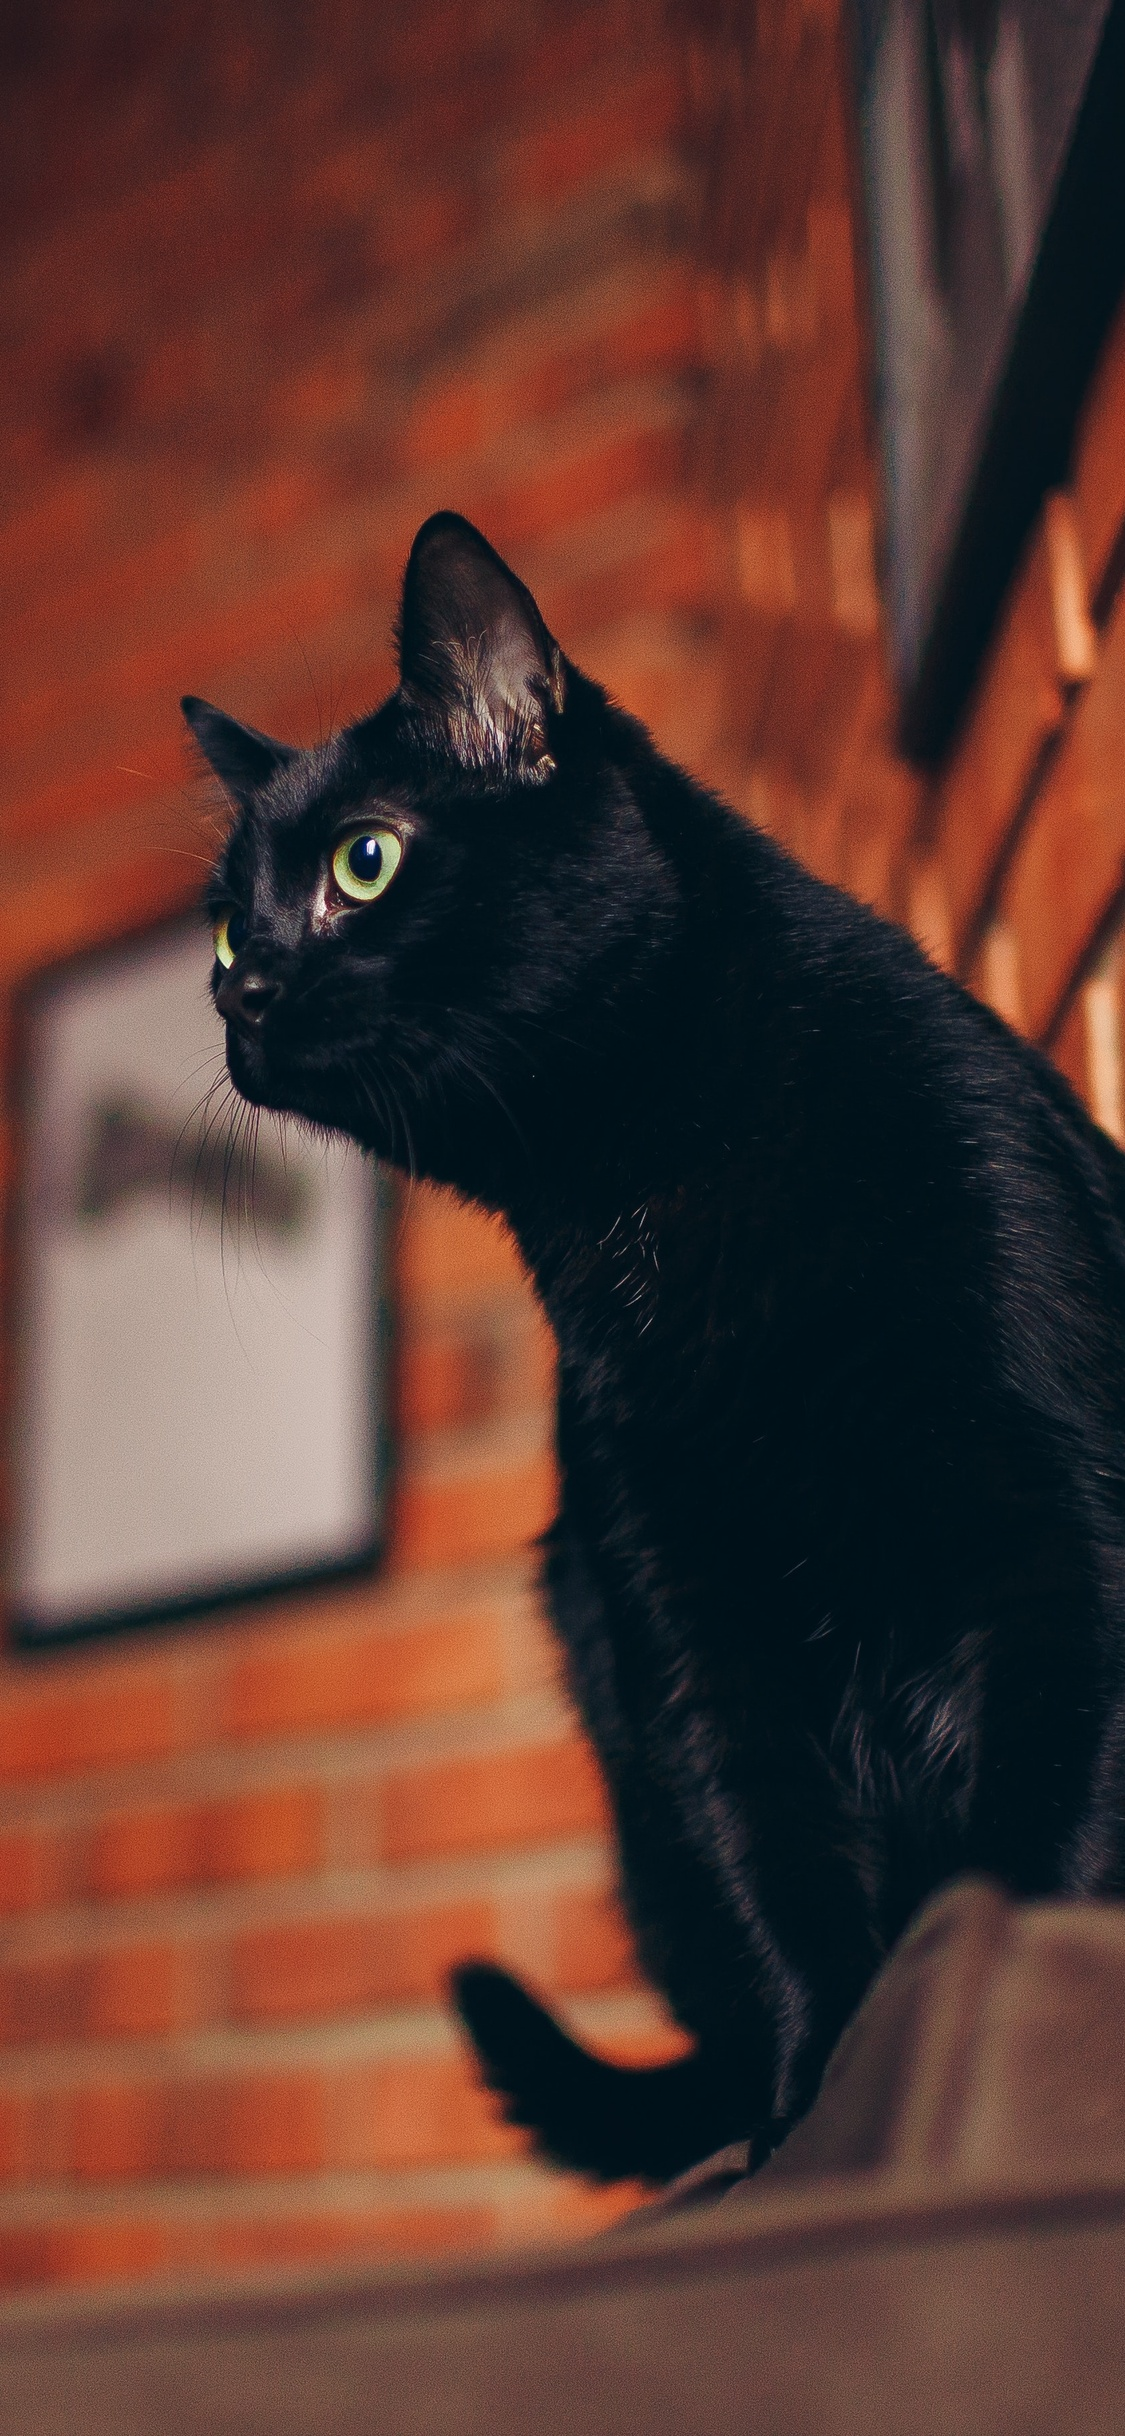 black-cat-portrait-5k-sw.jpg